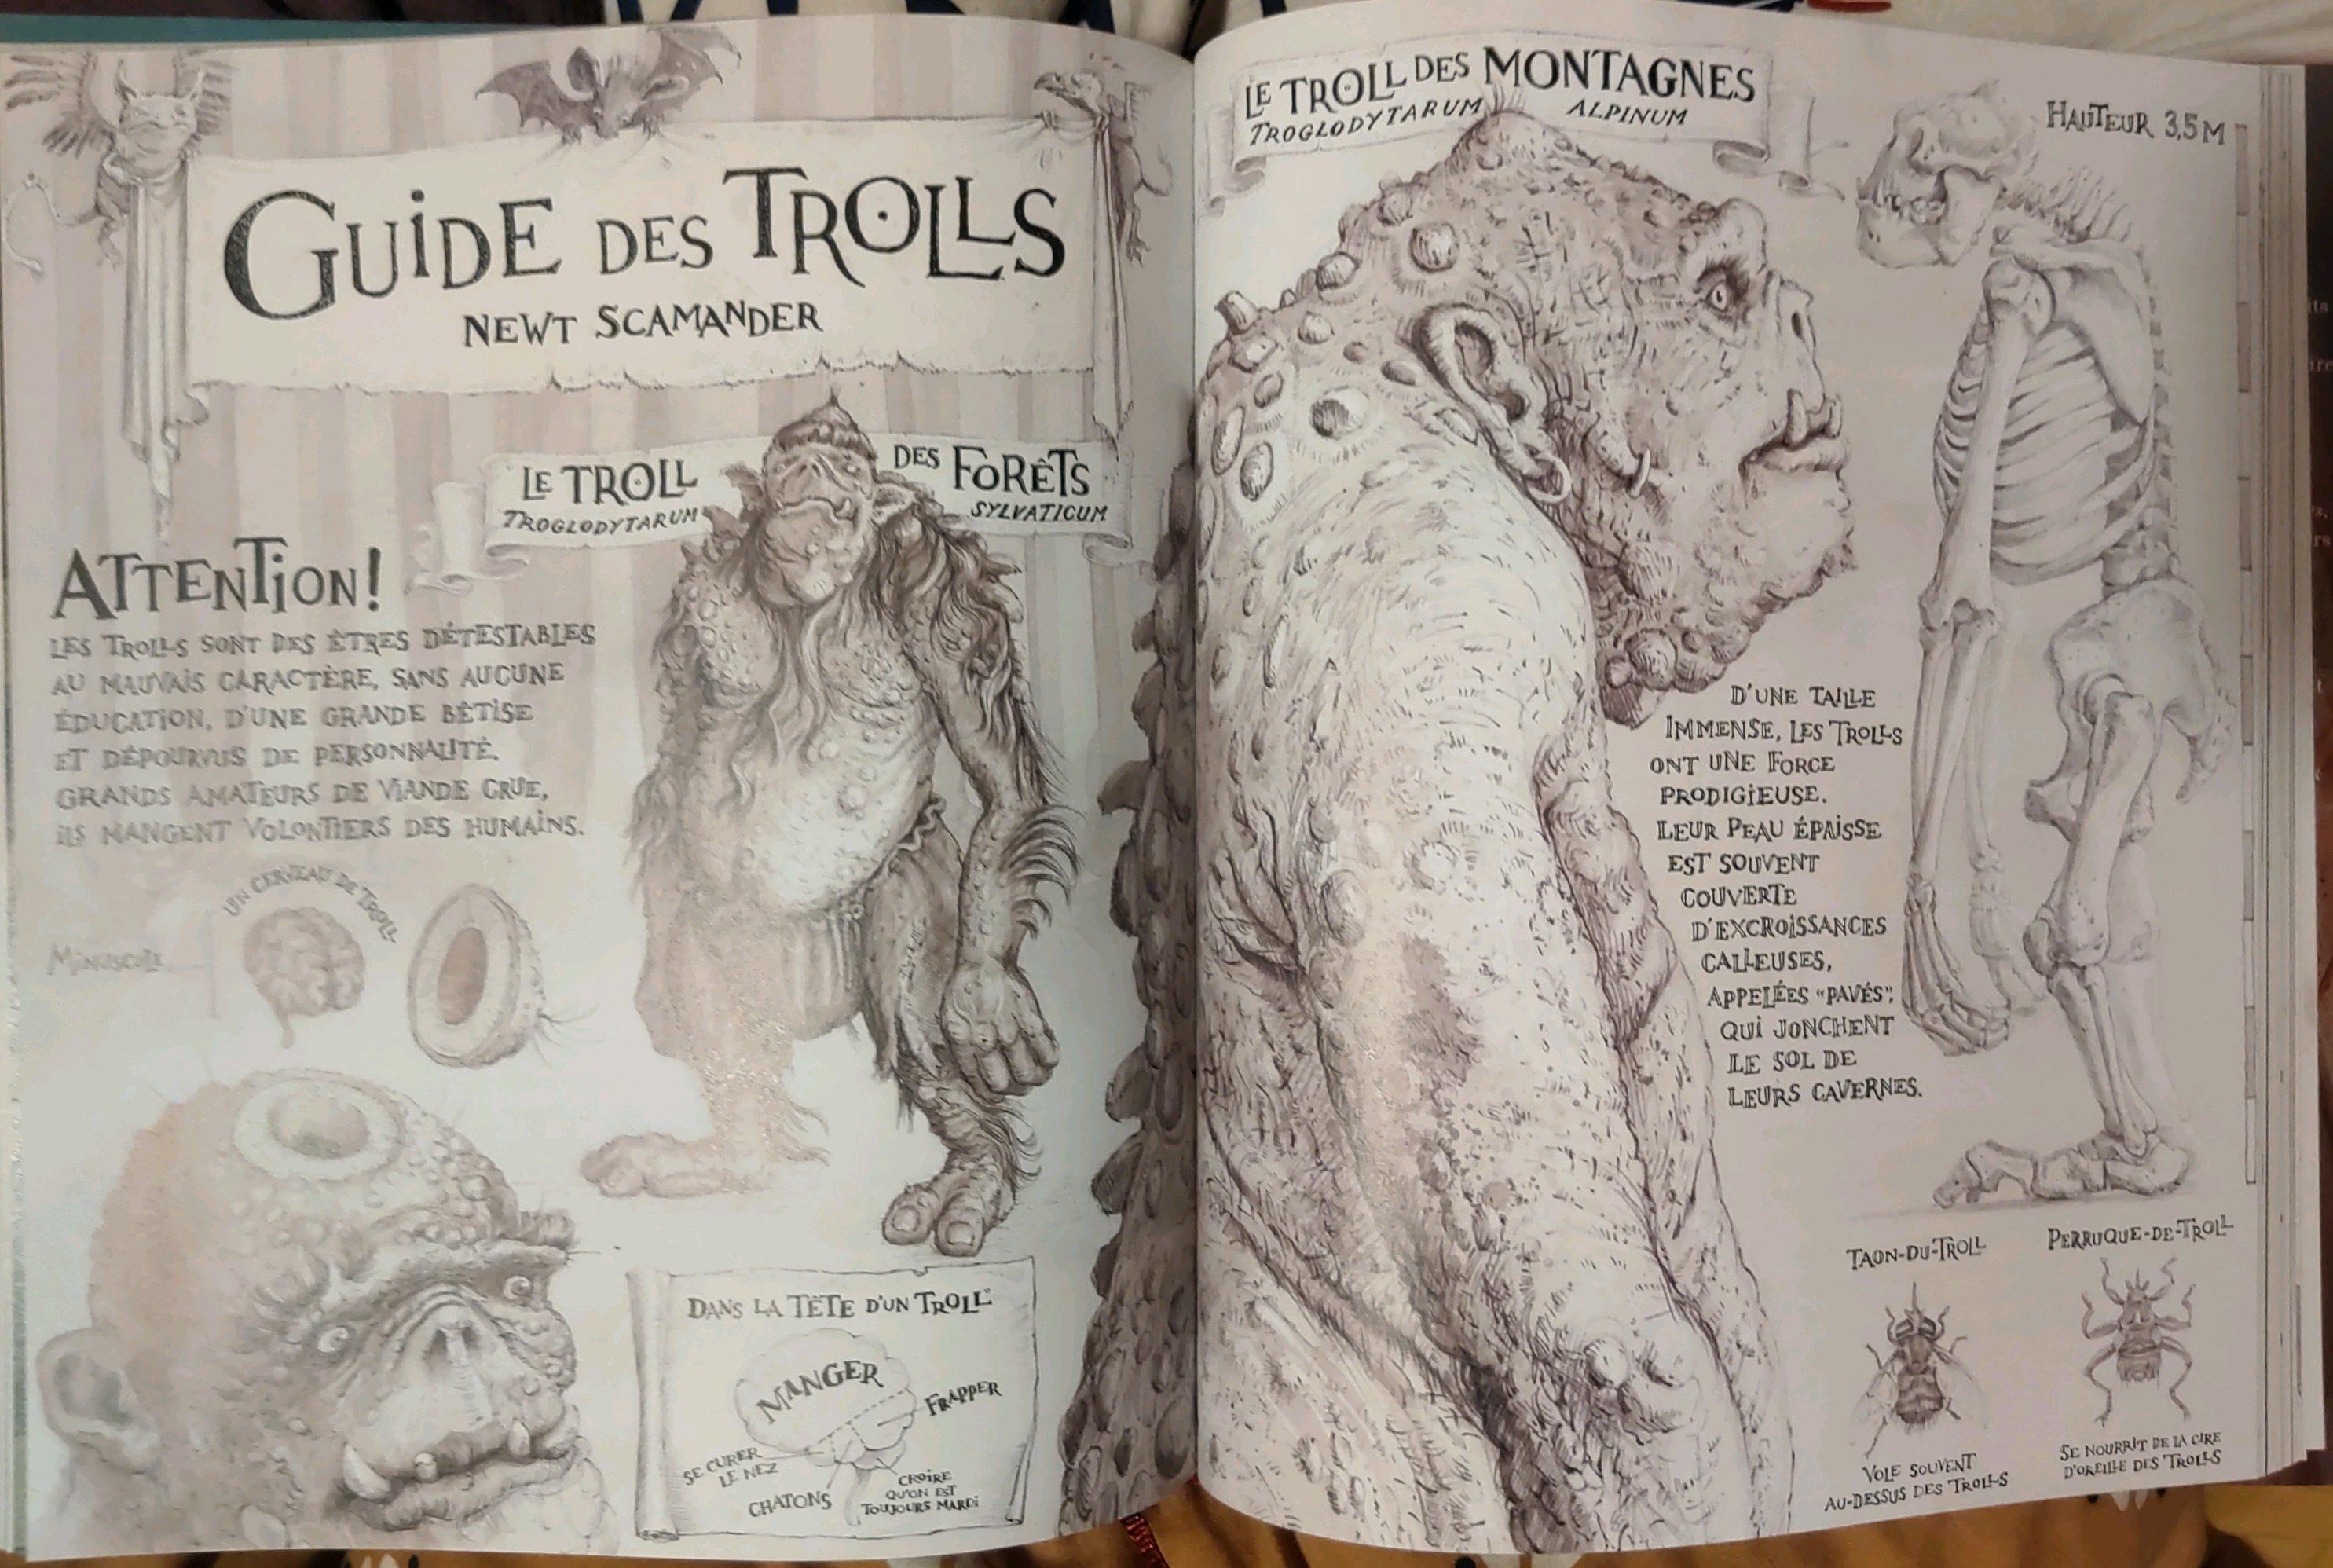 Guide des Trolls